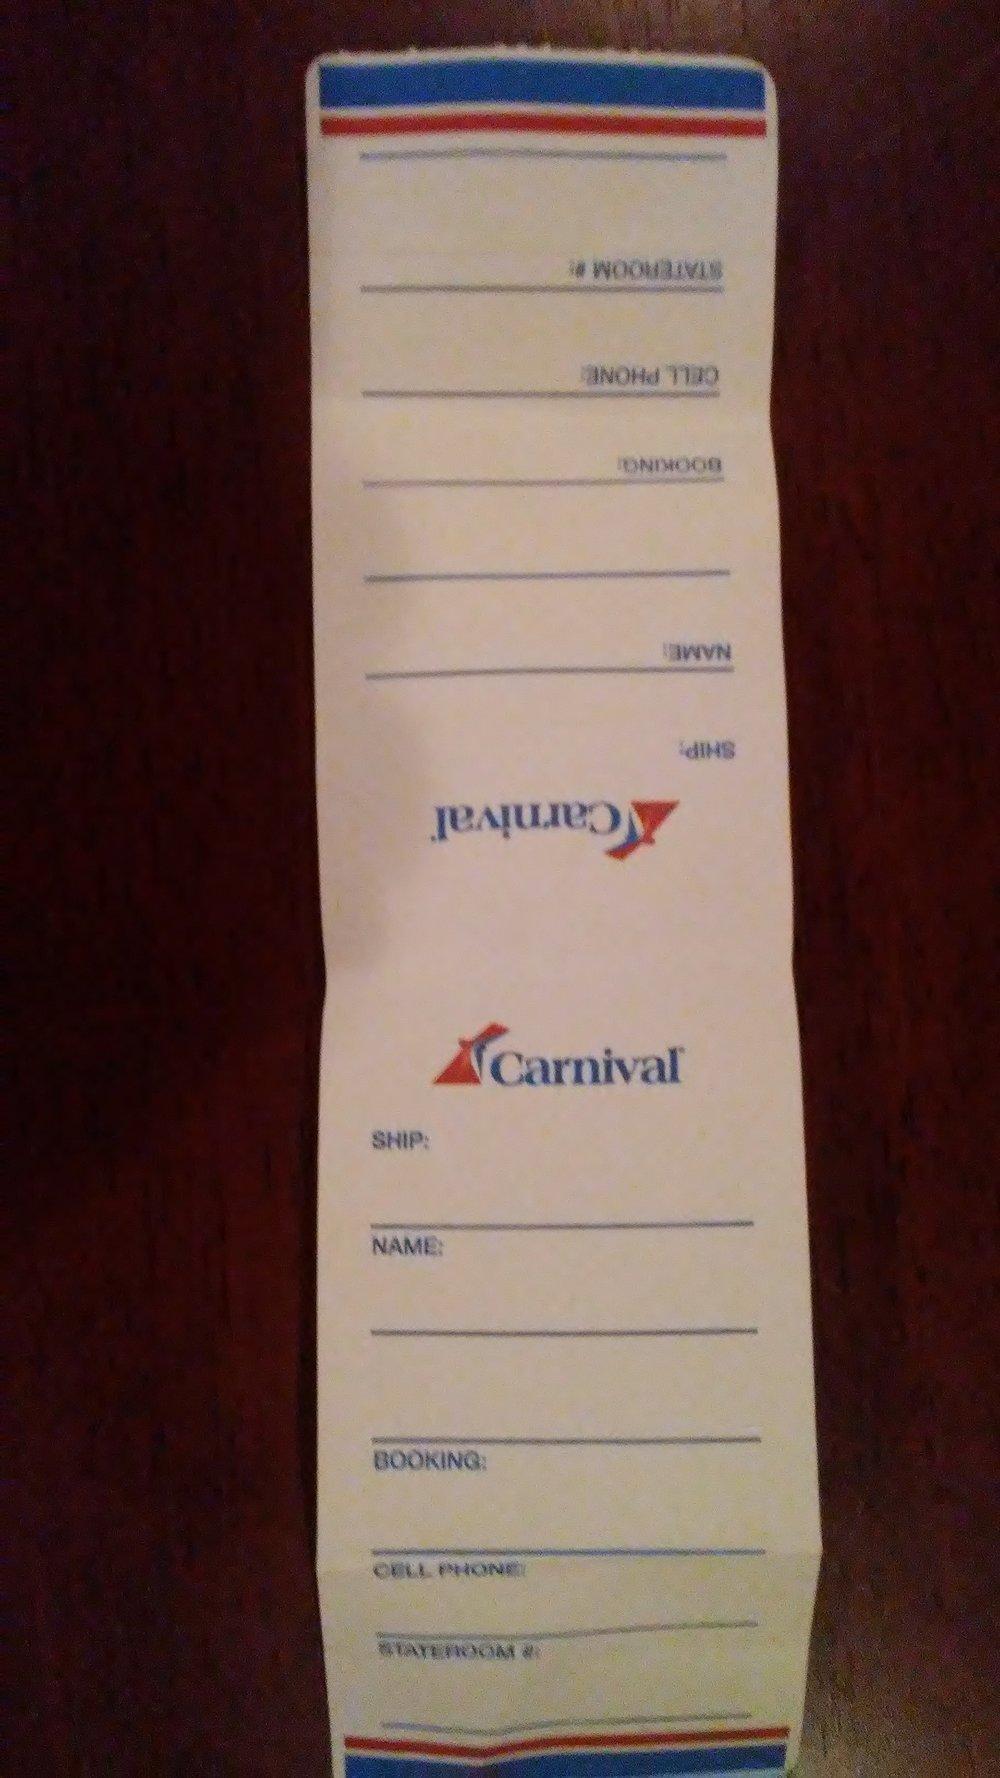 carnival luggage tag.jpg